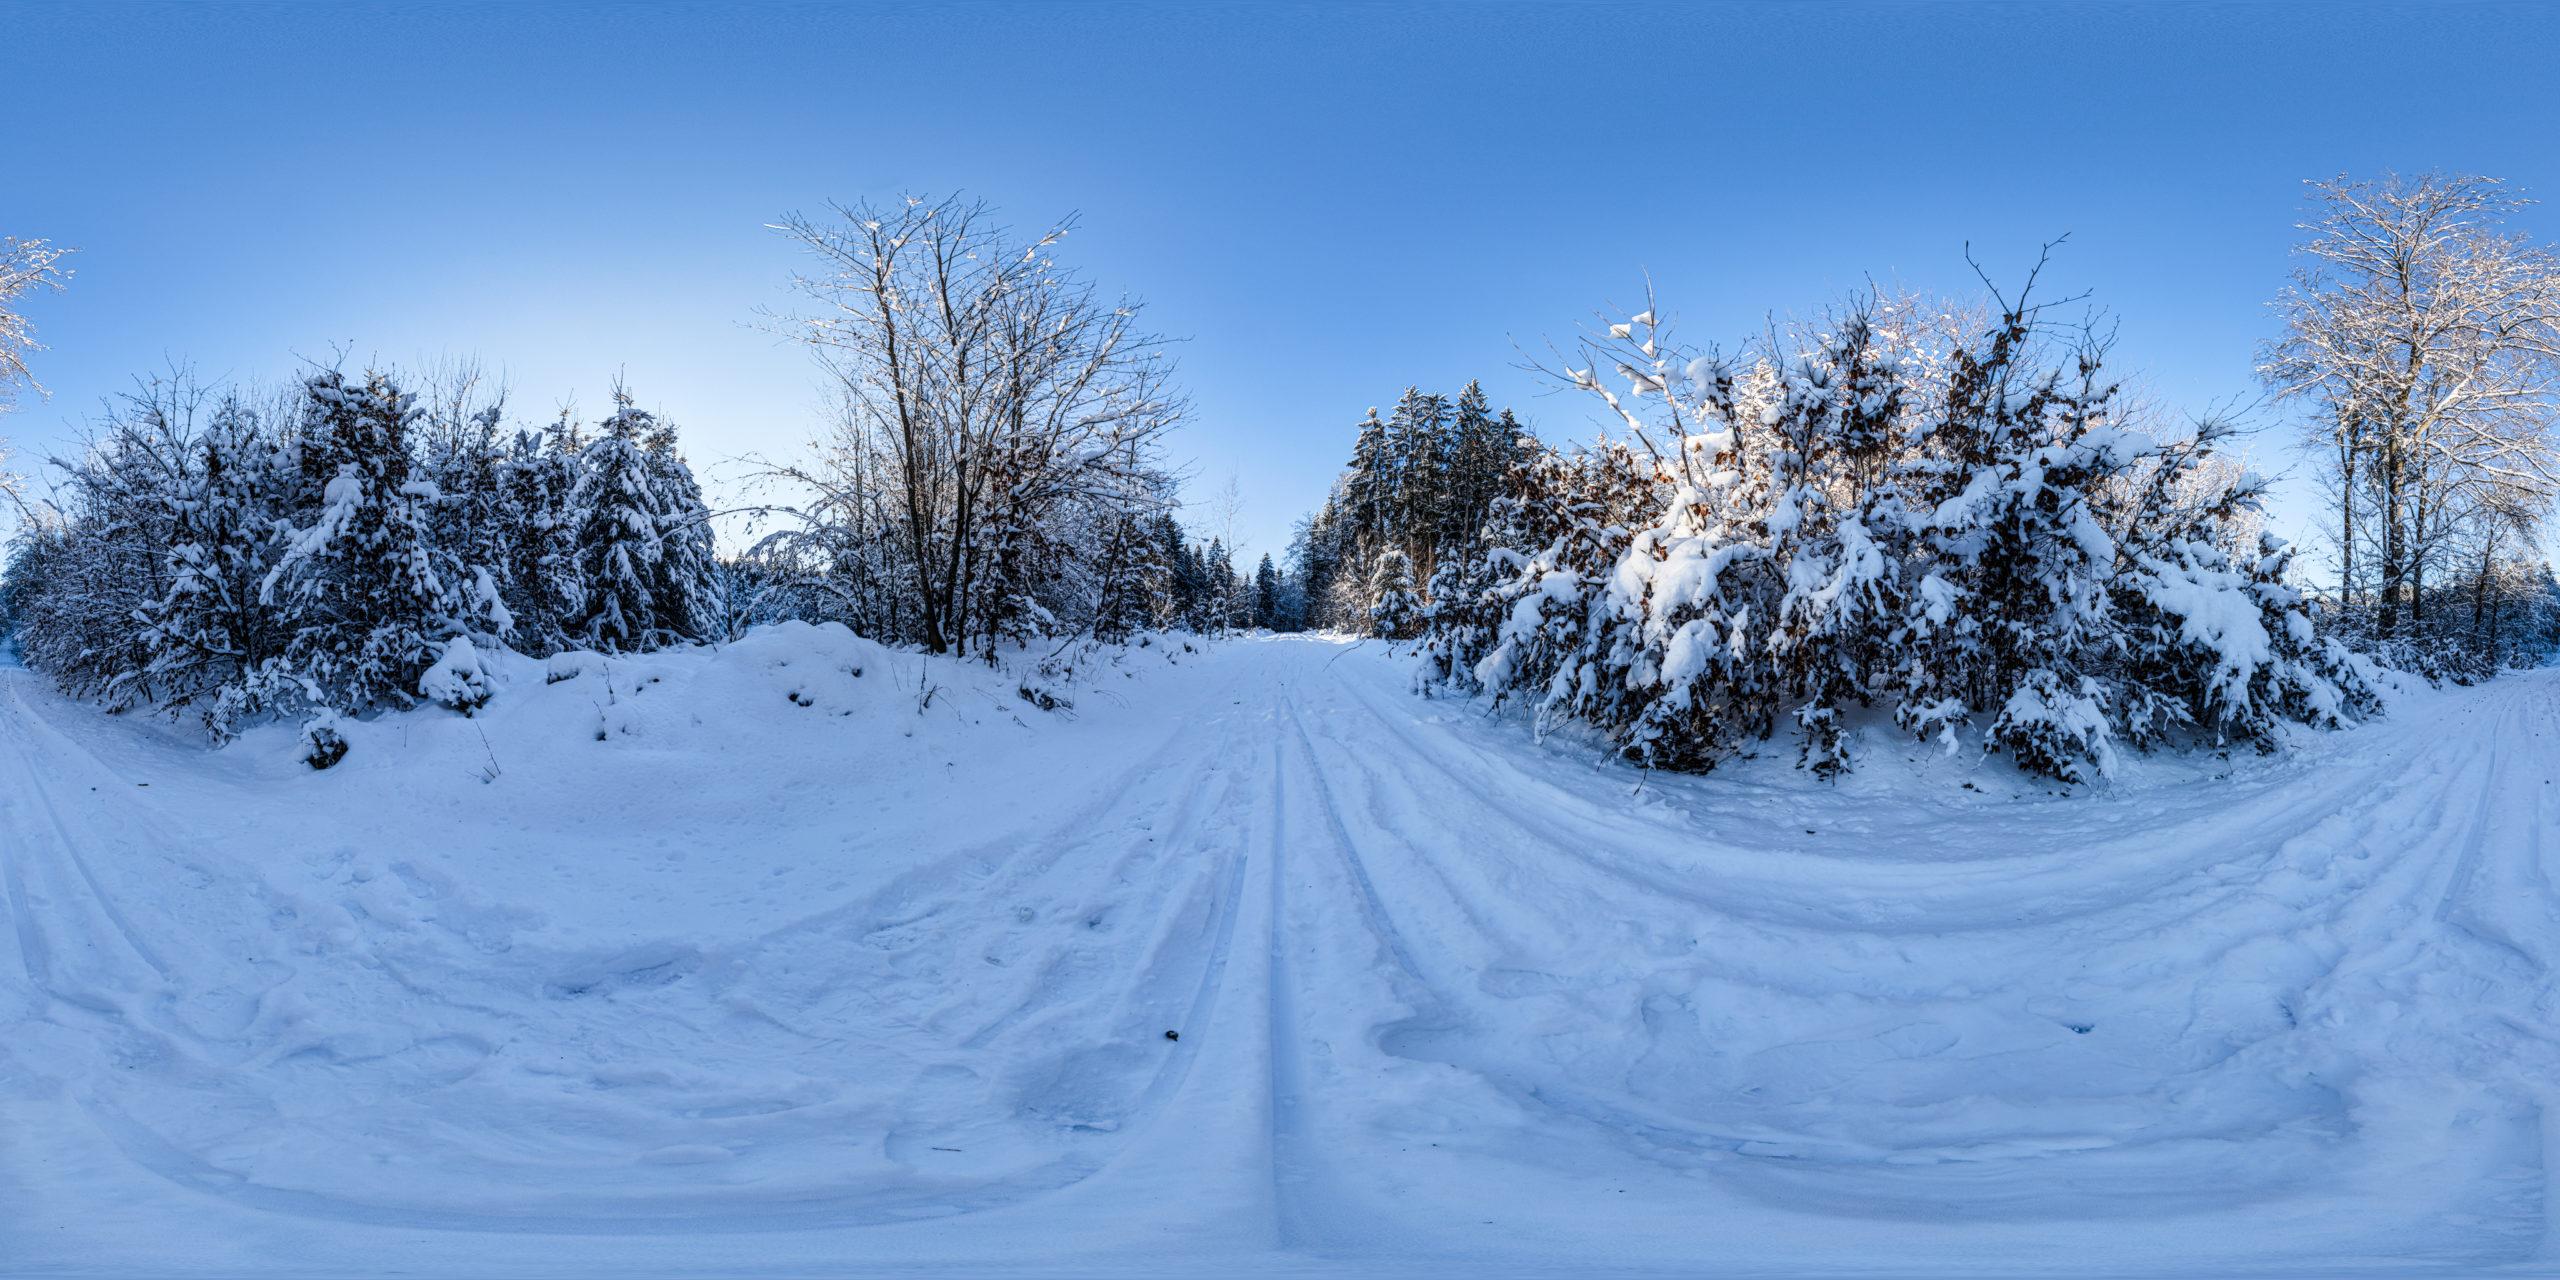 HDRI-Skies-Snowy-Path-Uhlberg